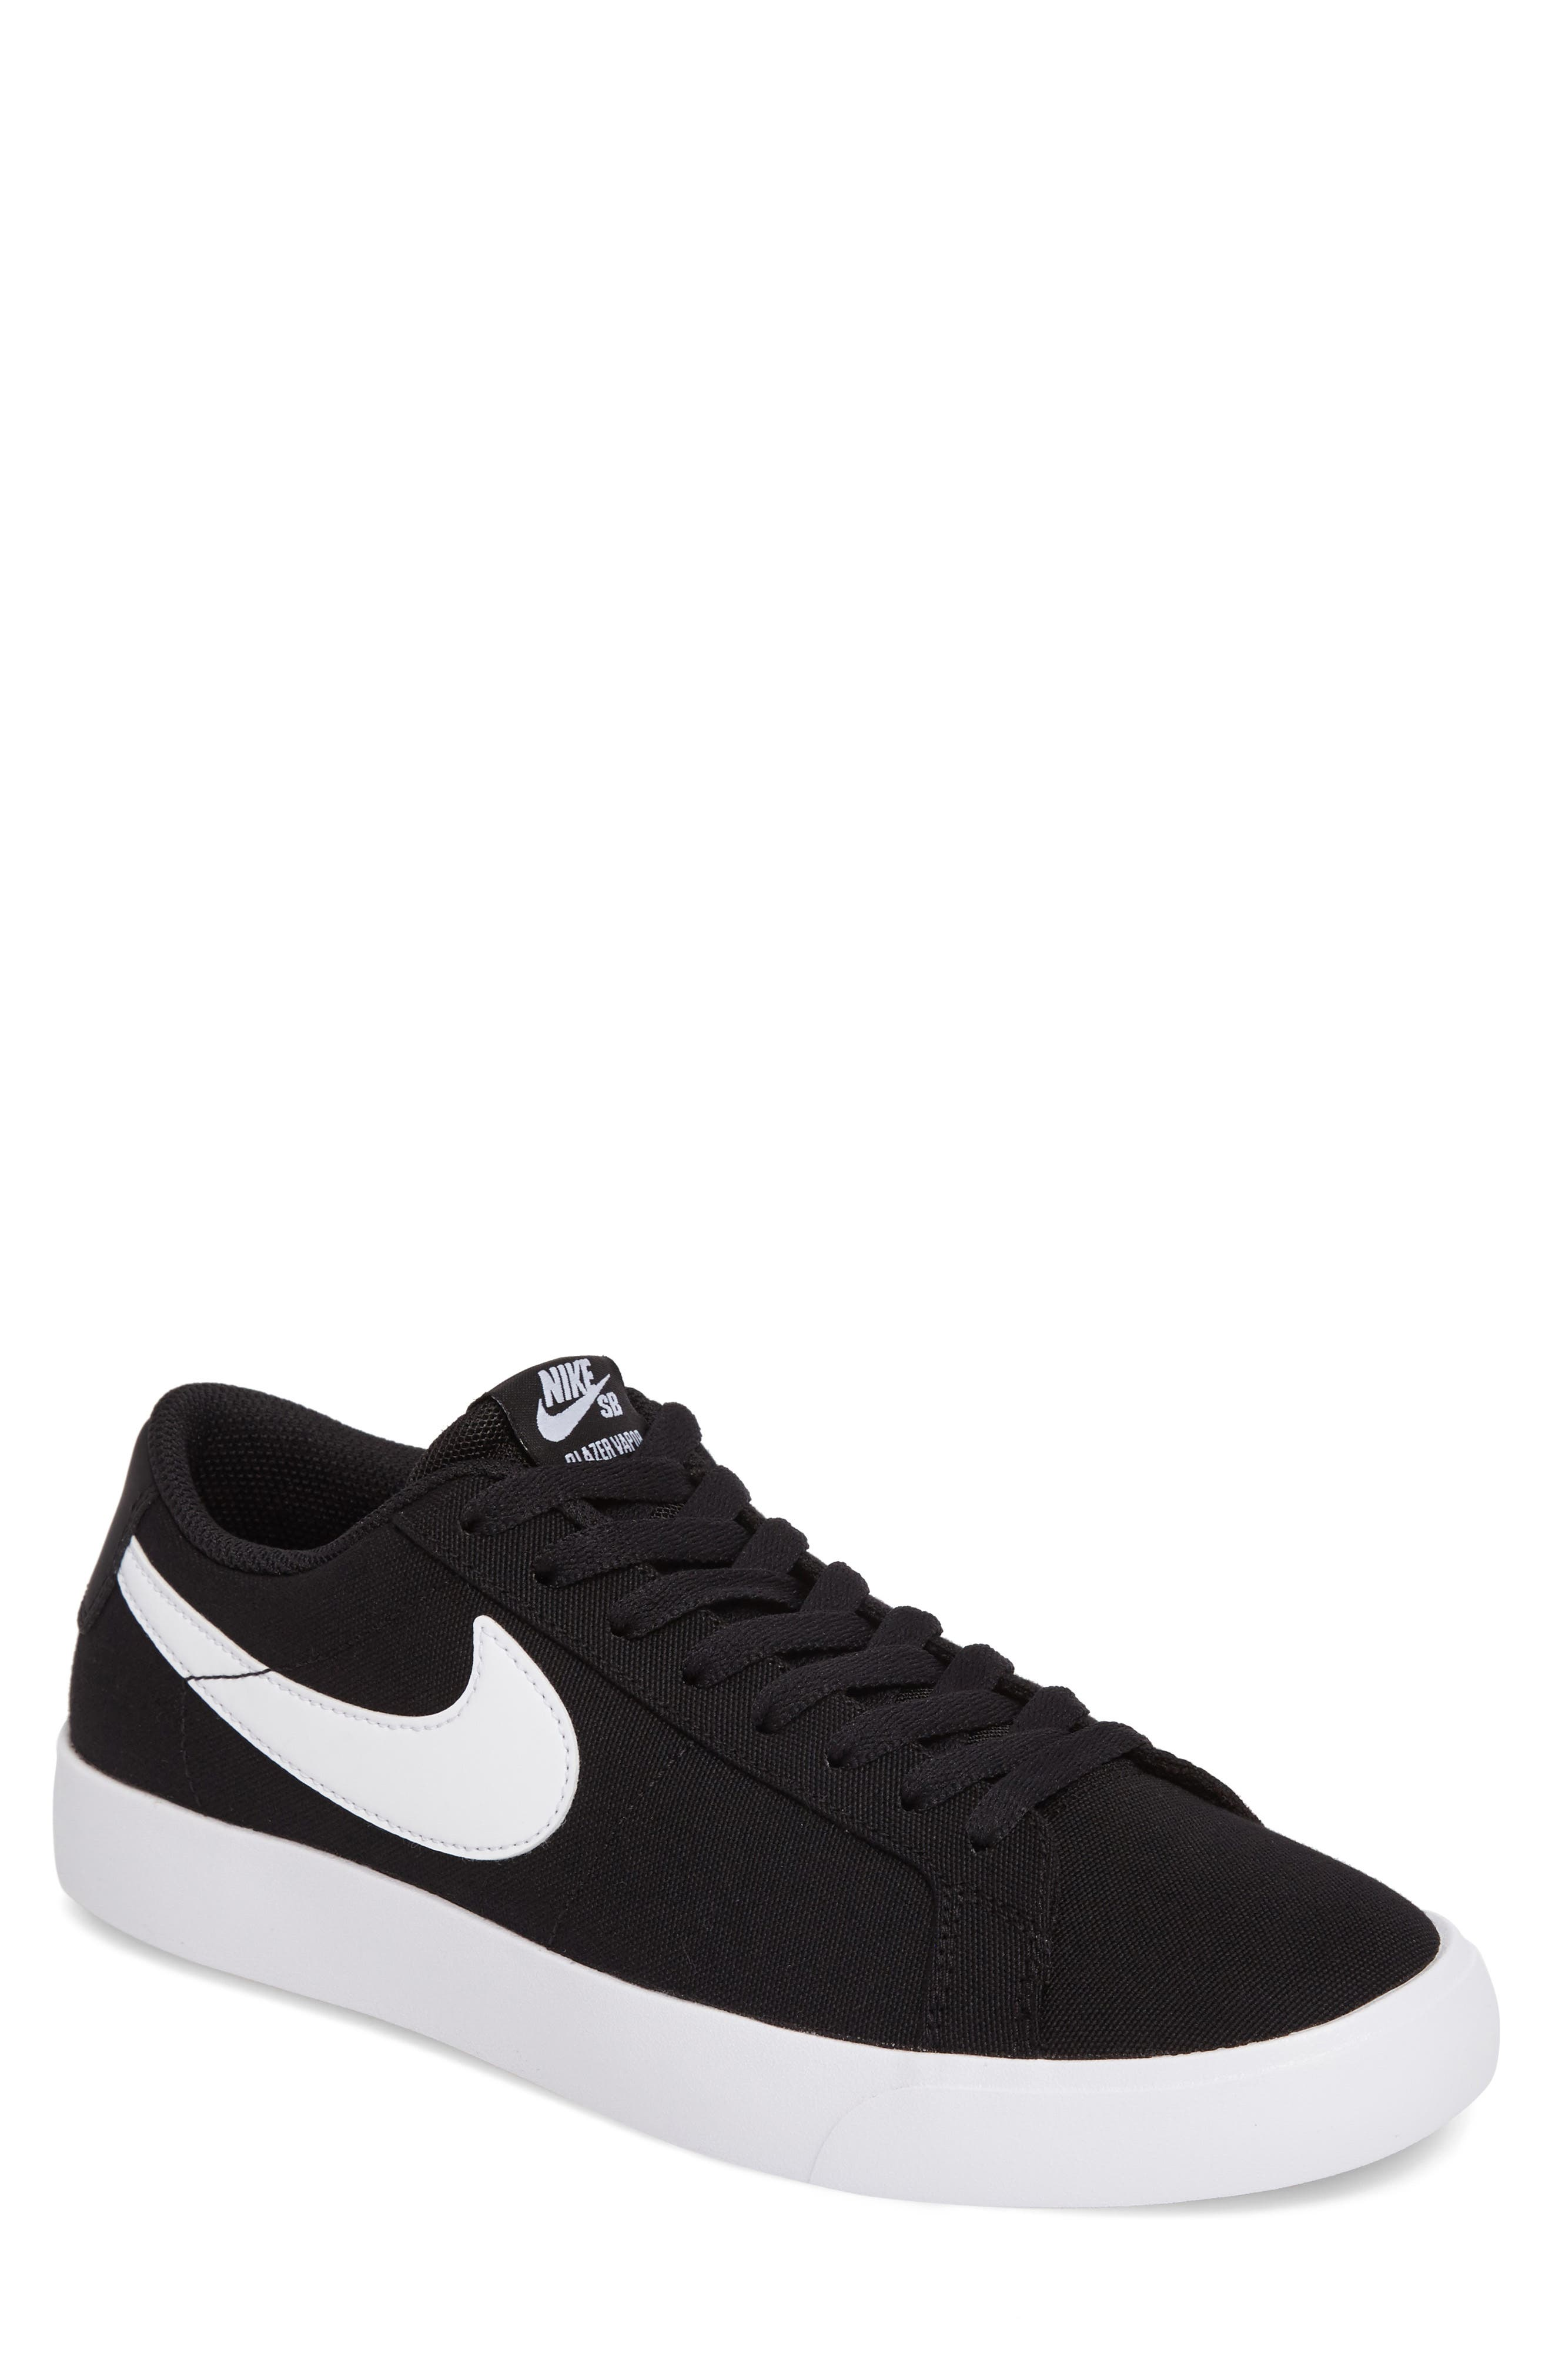 Alternate Image 1 Selected - Nike Zoom Blazer Vapor Skate Sneaker (Men)